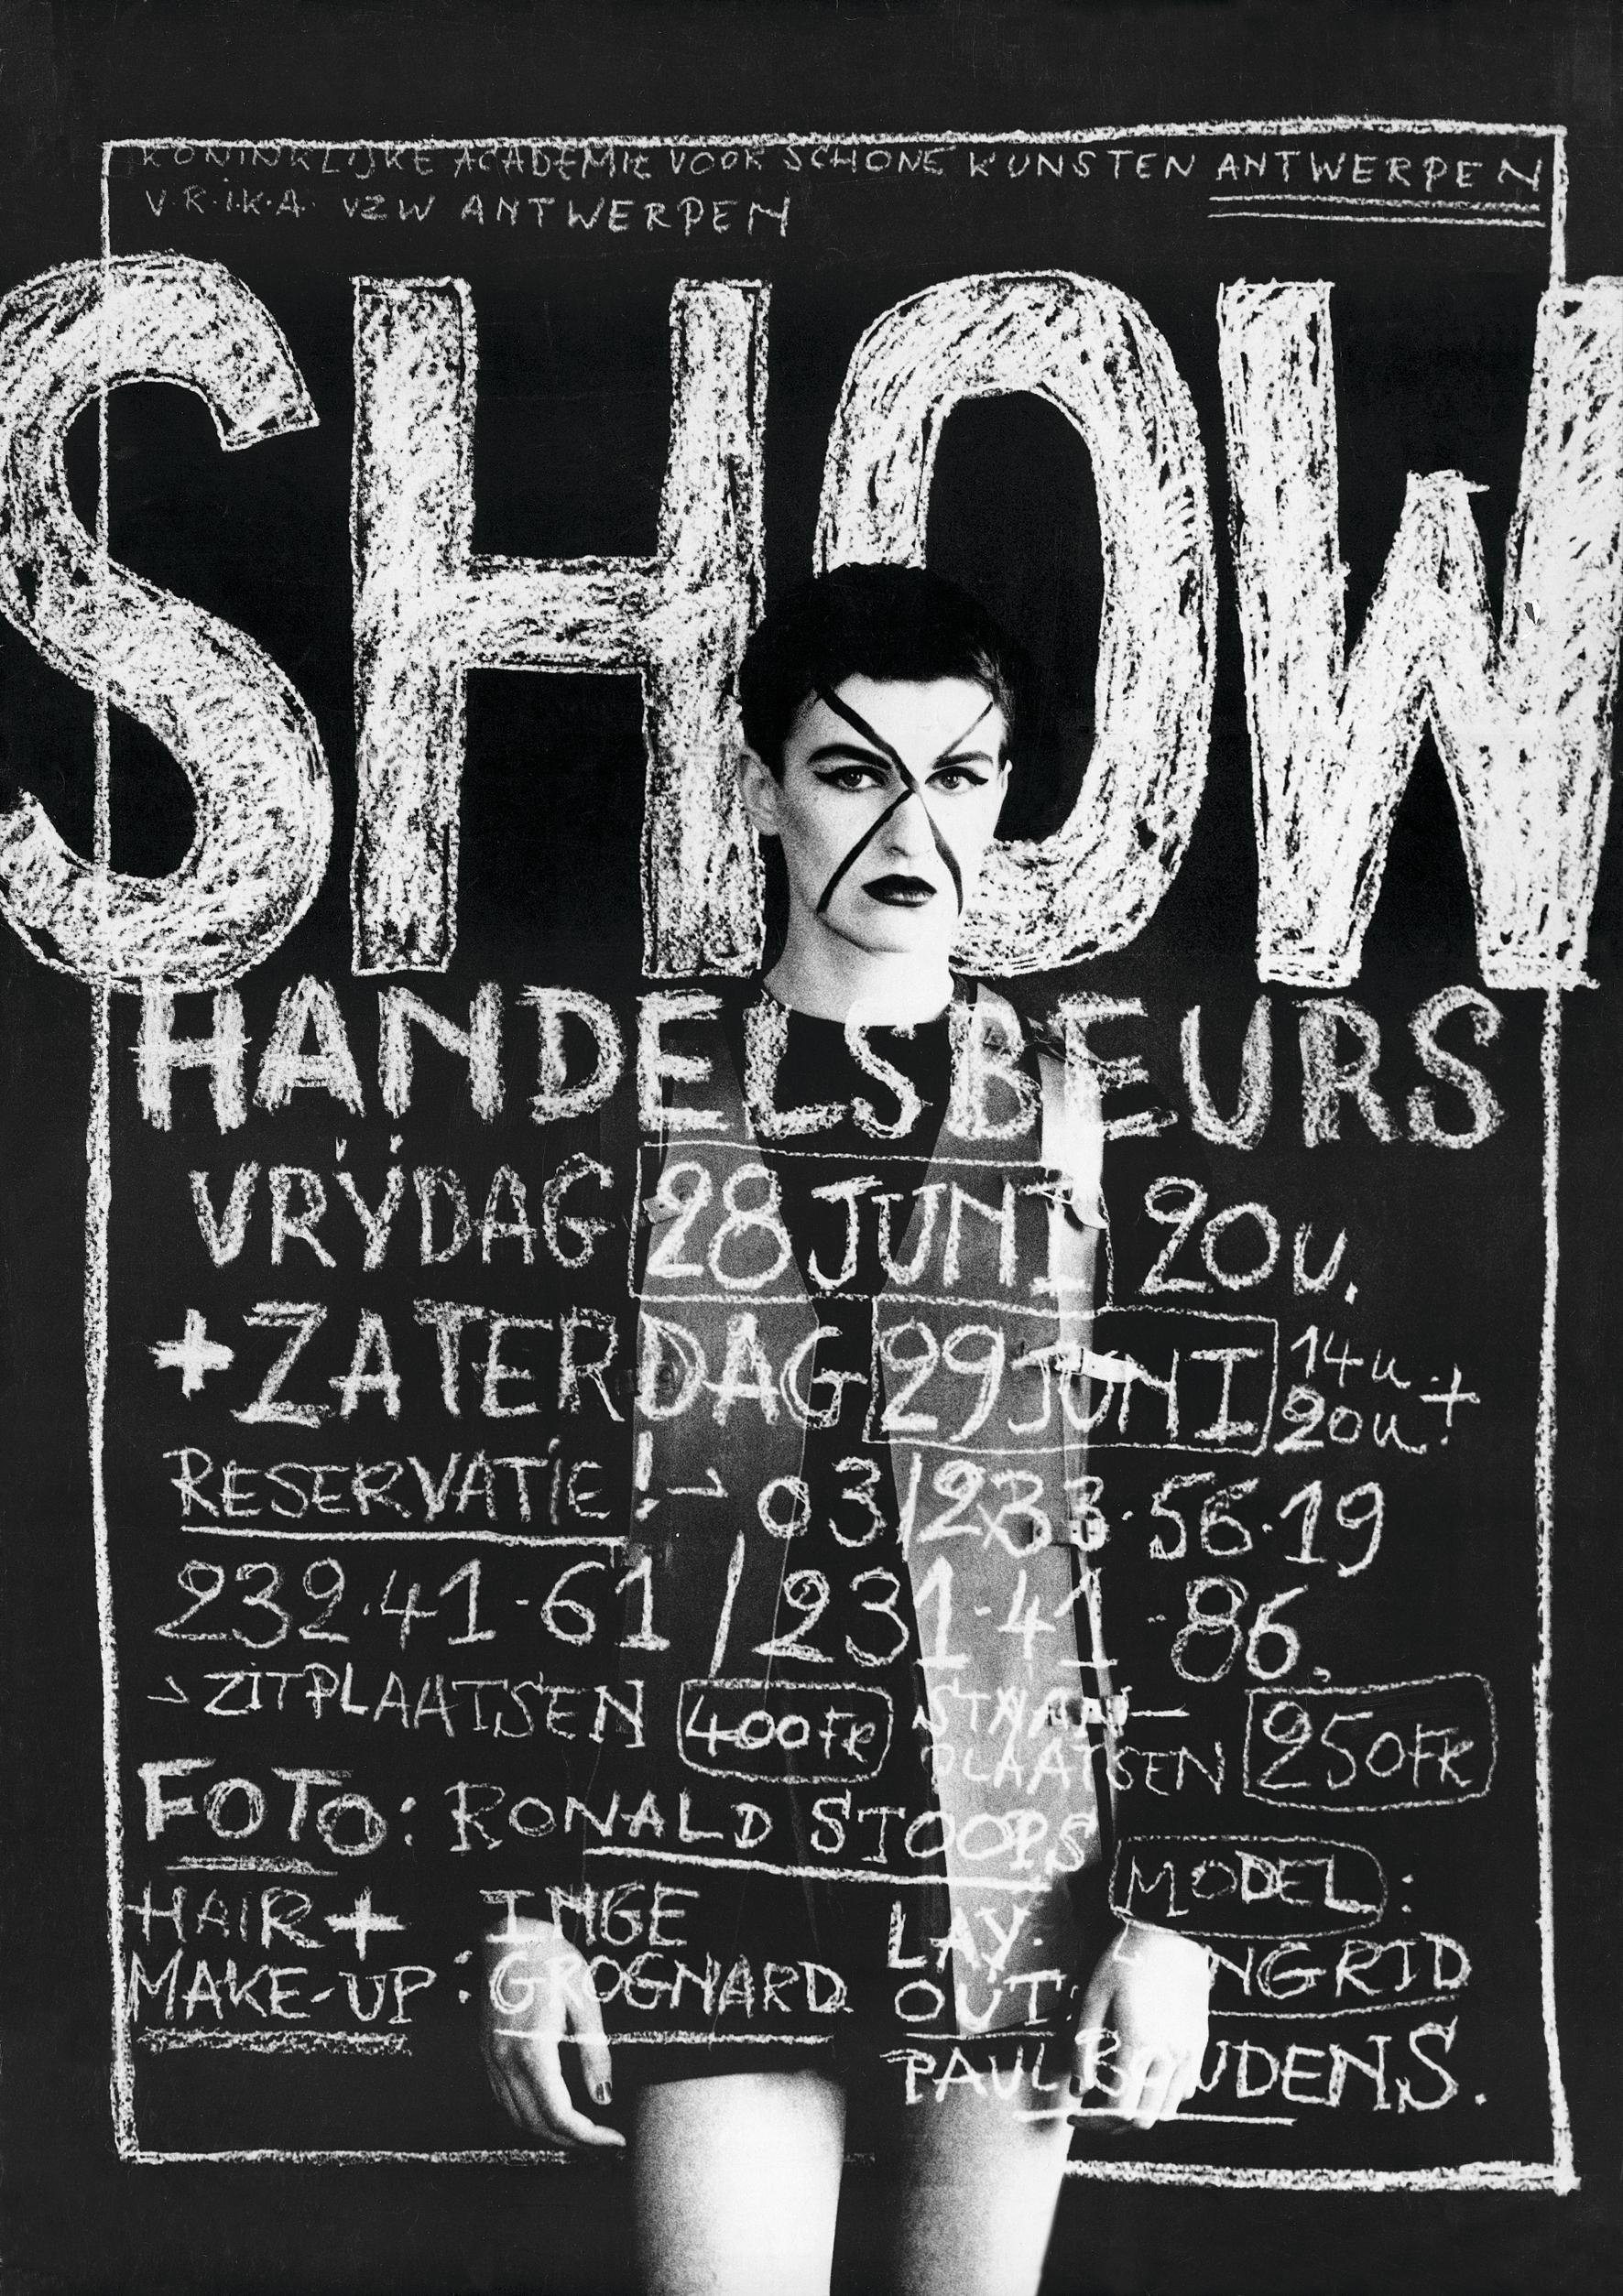 1991 ModeAcademie Show Poster